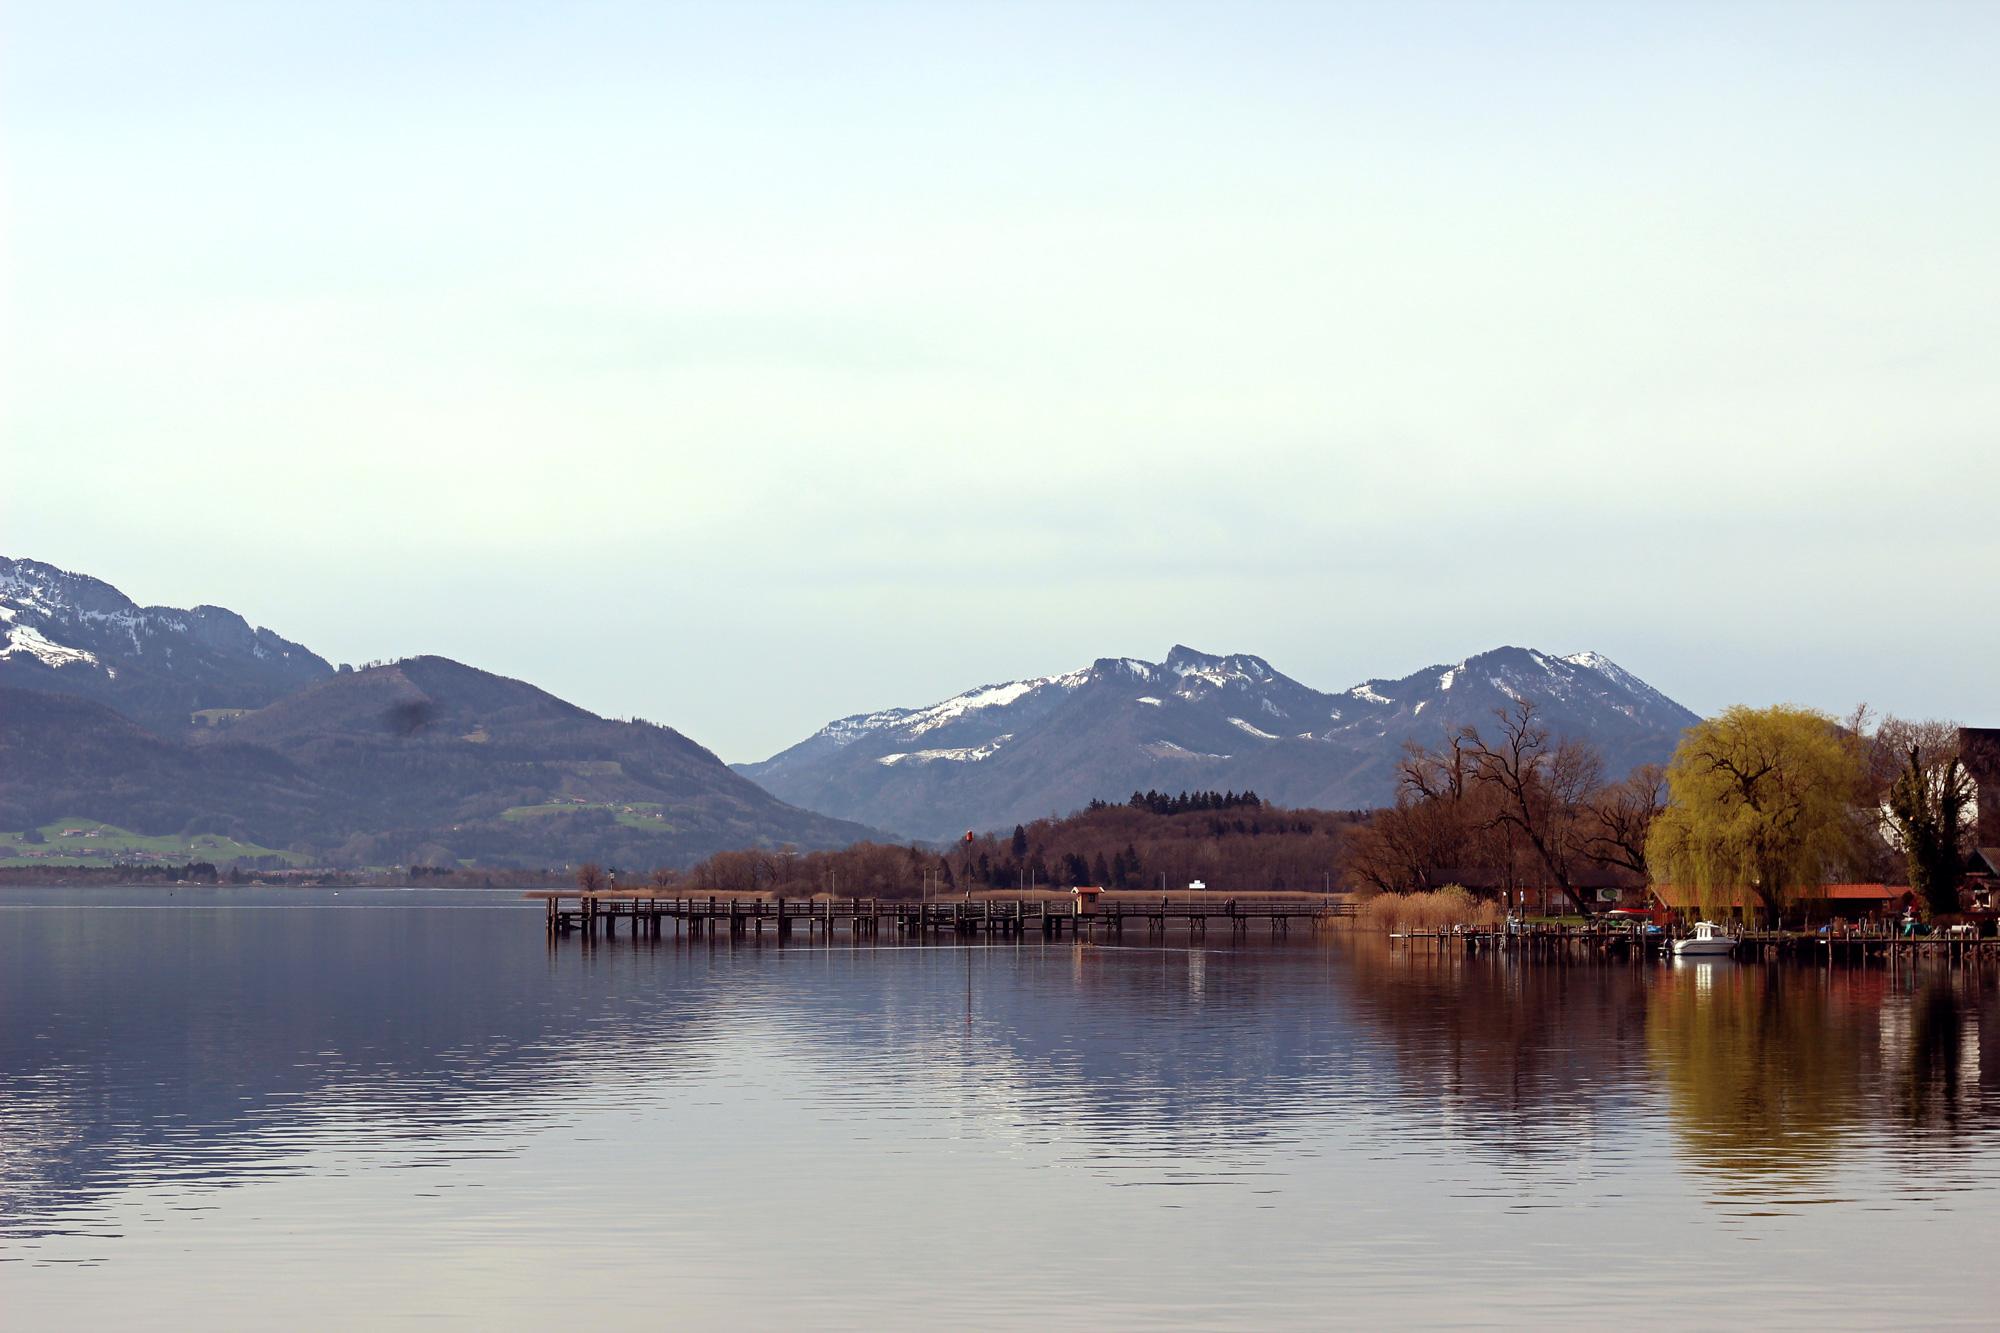 Cheimsee-lake-Bayern-weekend-escape-14